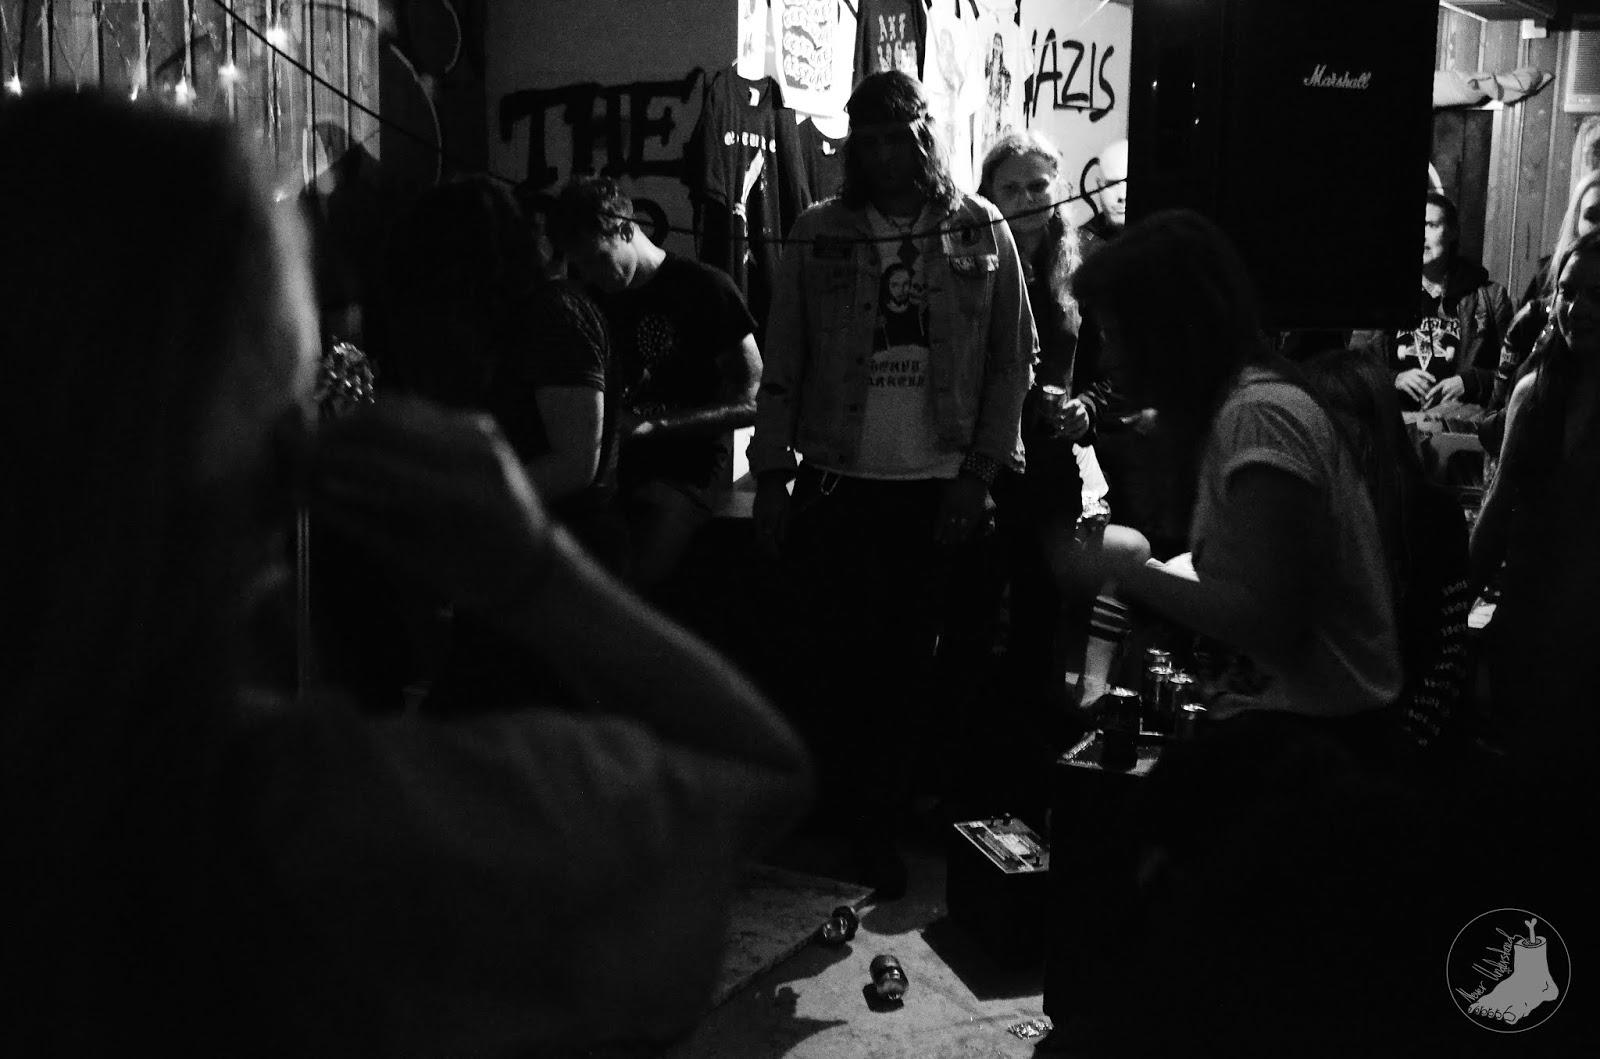 Fraggelberget: Hag, Gestures & Axe Rash